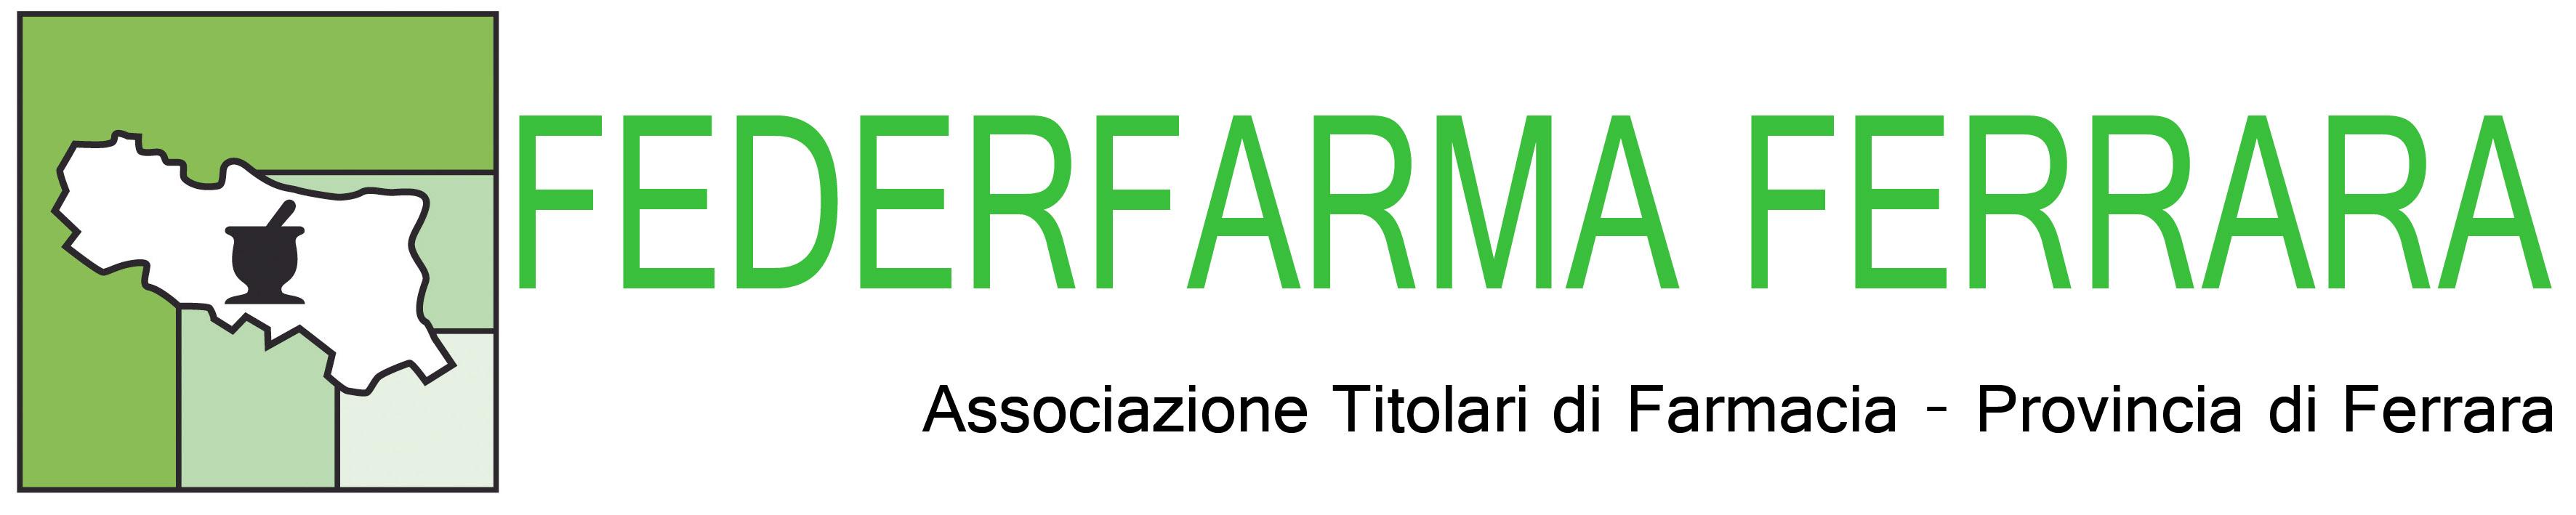 Farmacie Ferrara